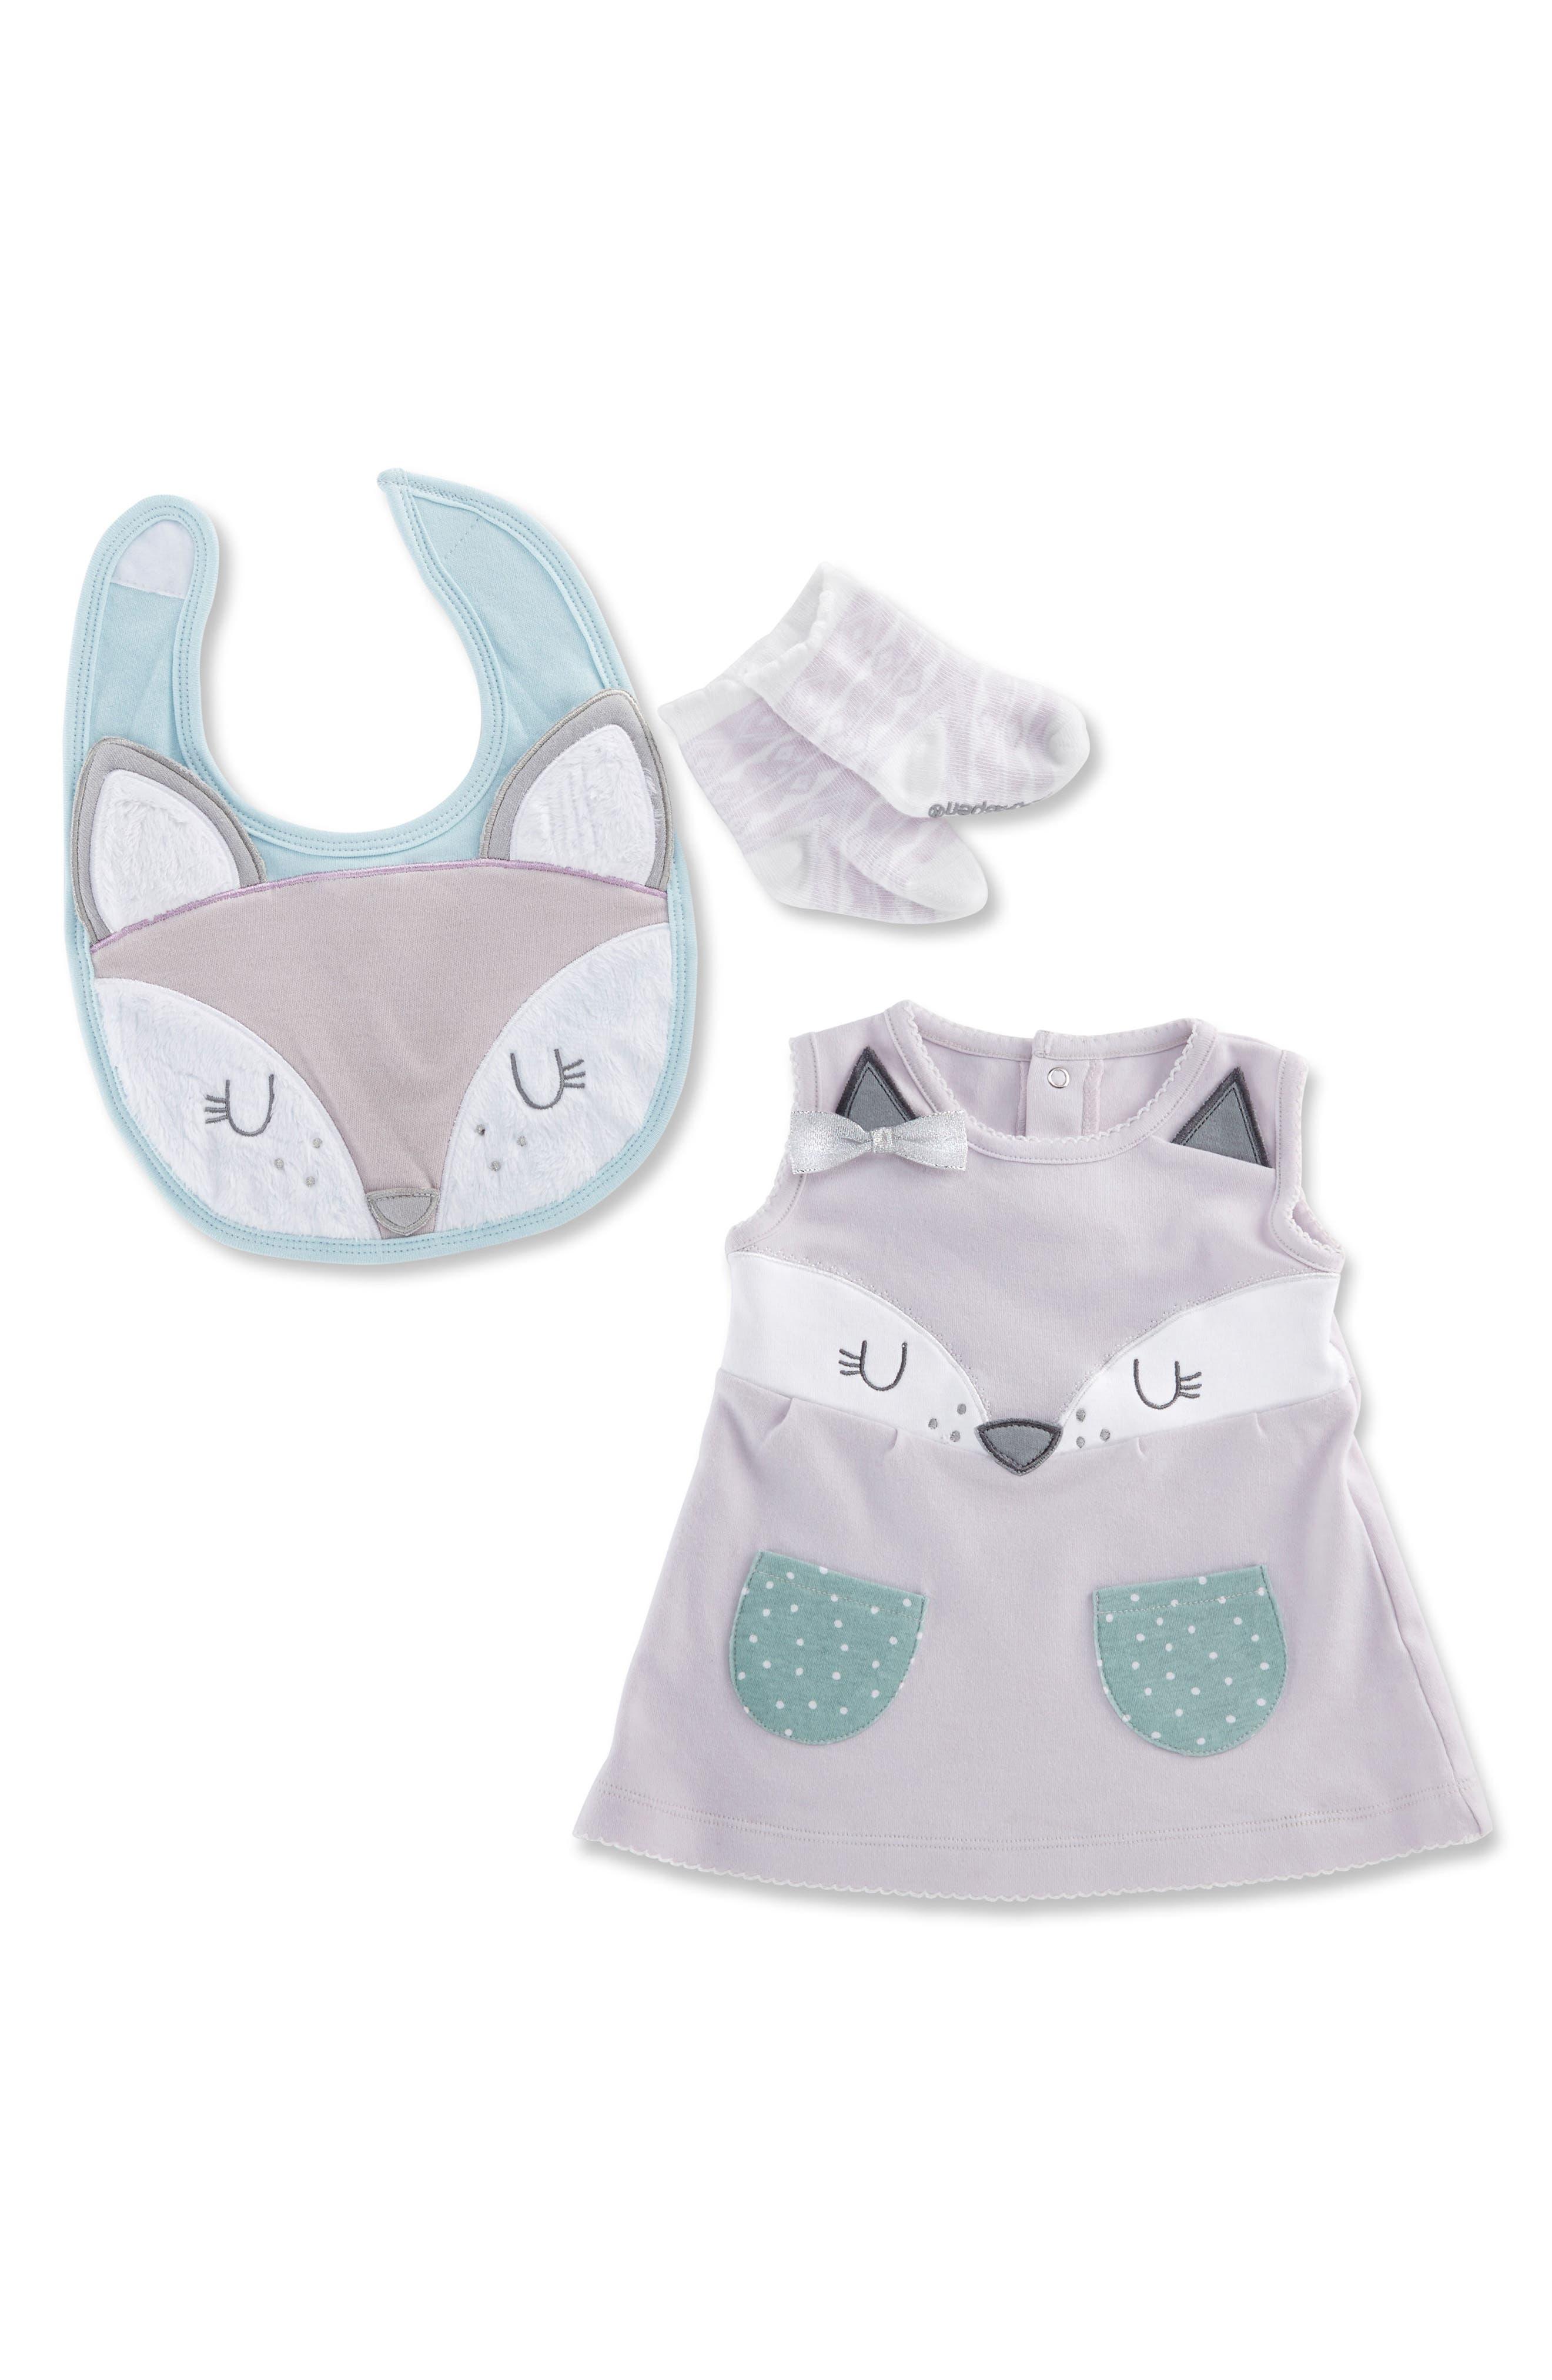 Forest Friends Fox Dress, Bib & Socks Set,                             Main thumbnail 1, color,                             Purple/ Aqua/ White